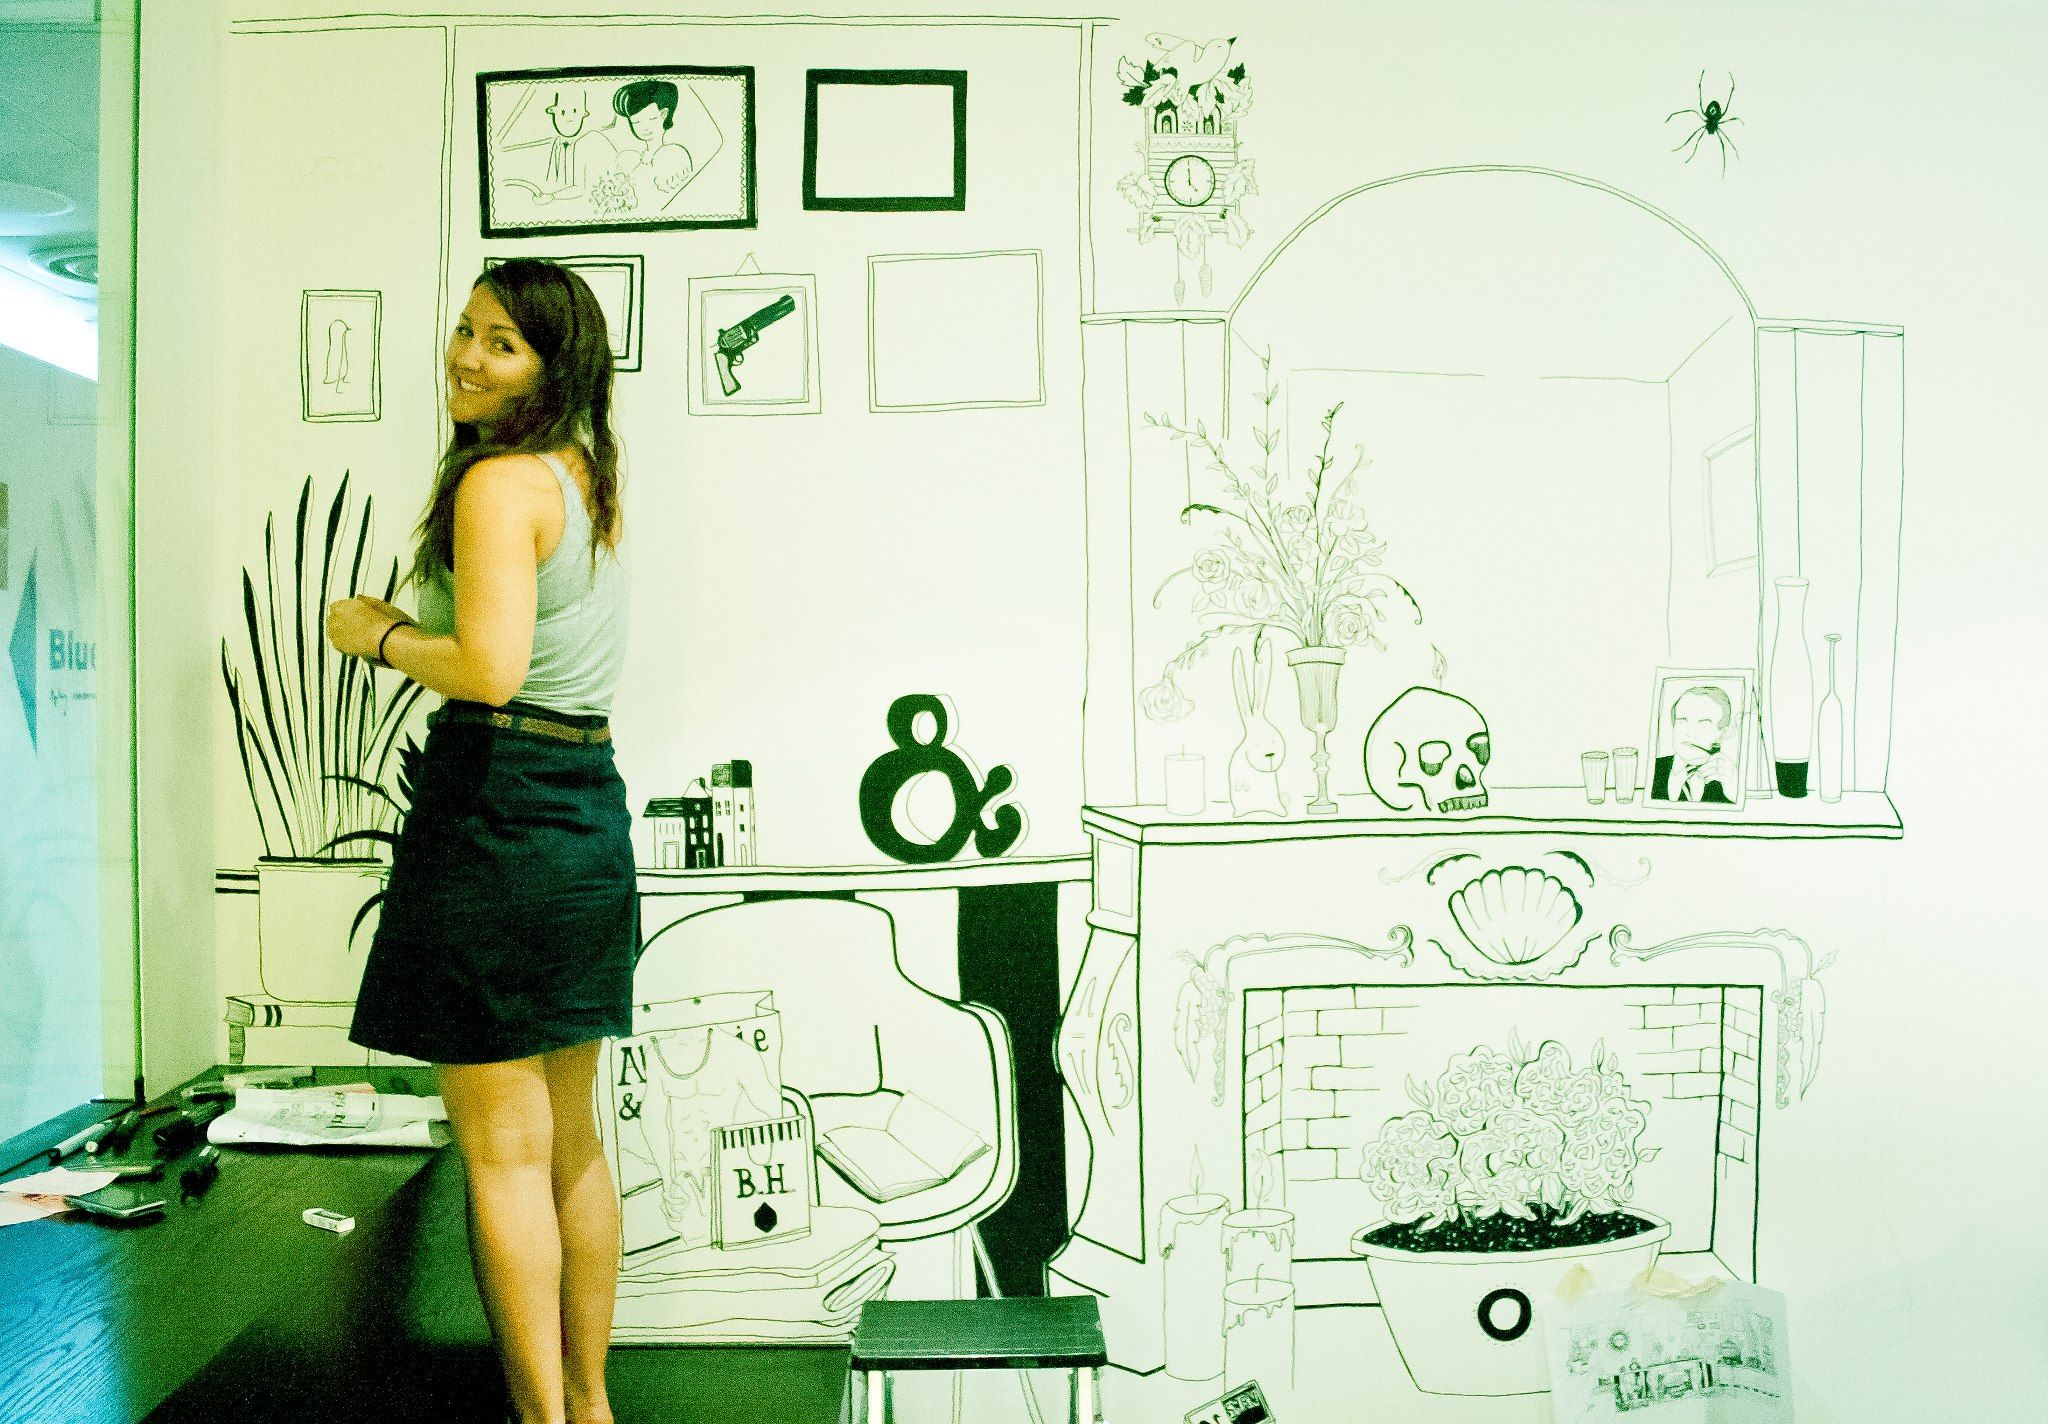 freehand graphic design creates office interior with unique creativity - Cool Graphic Design Ideas